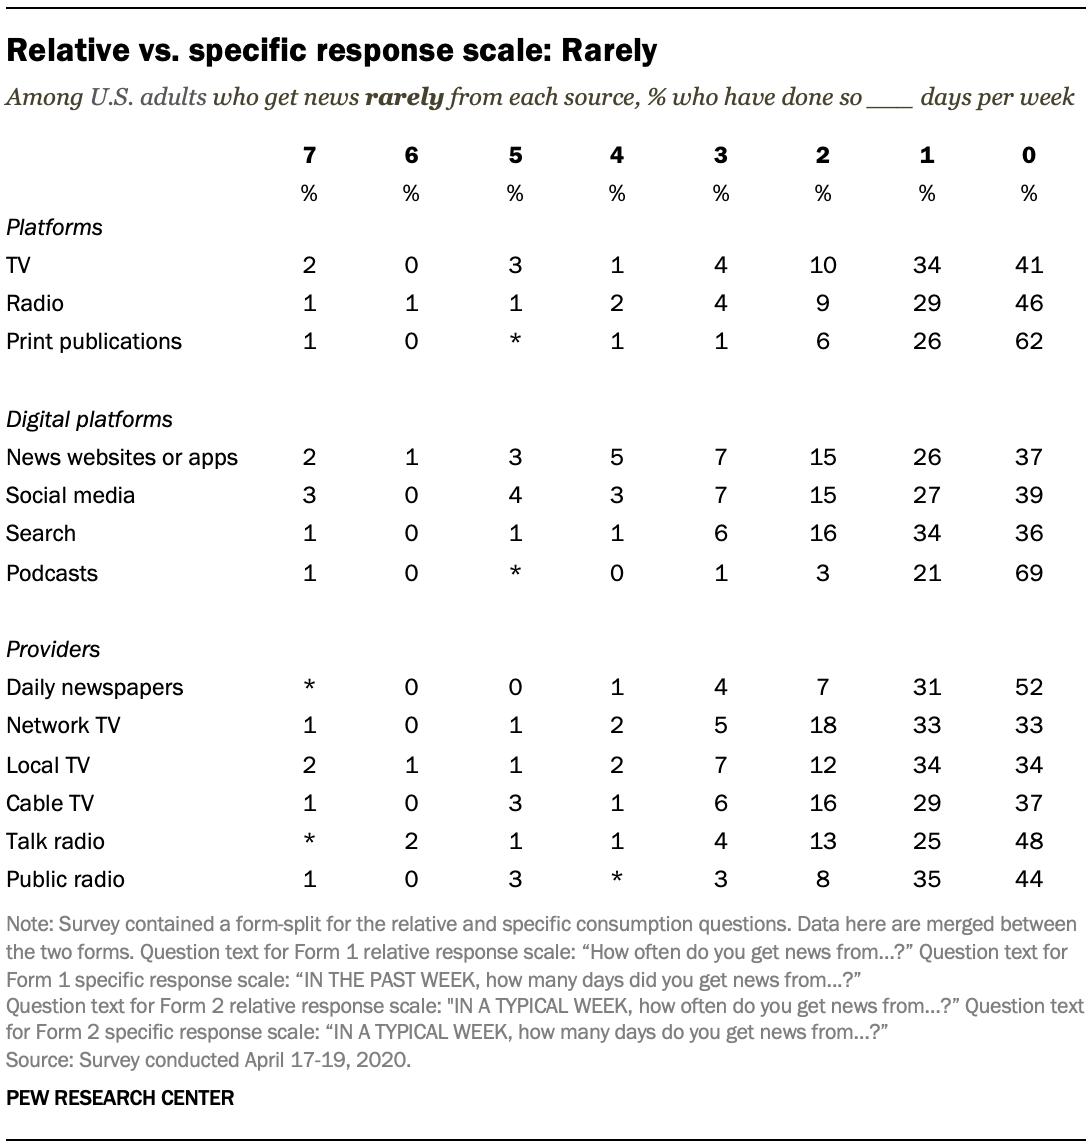 Relative vs. specific response scale: Rarely